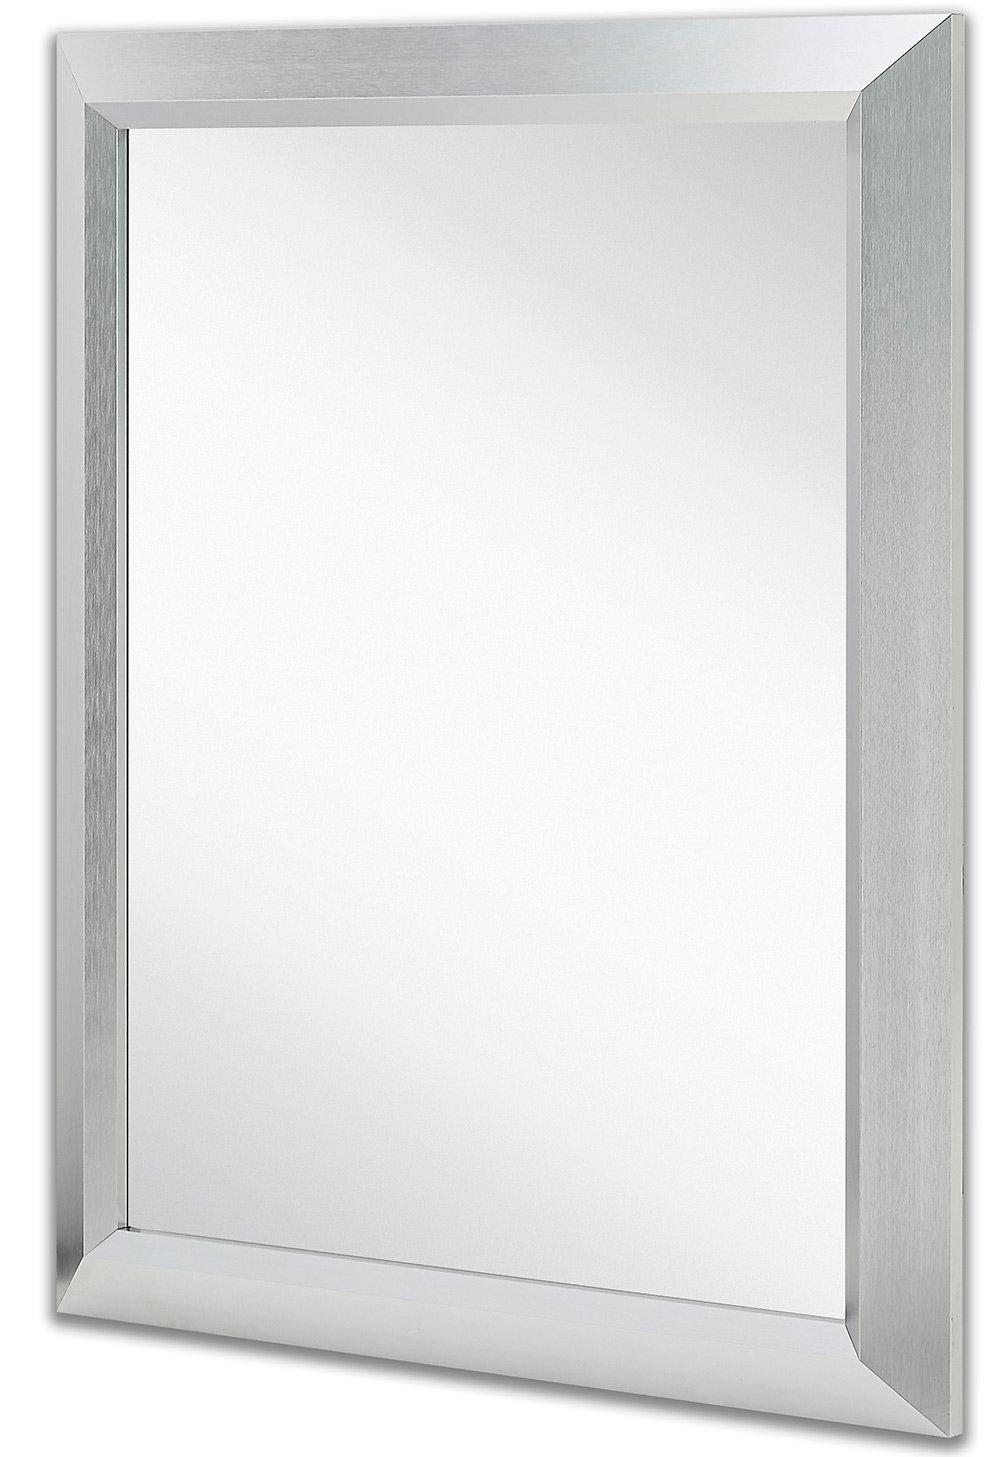 Premium Rectangular Brushed Aluminum Wall Mirror (View 2 of 20)